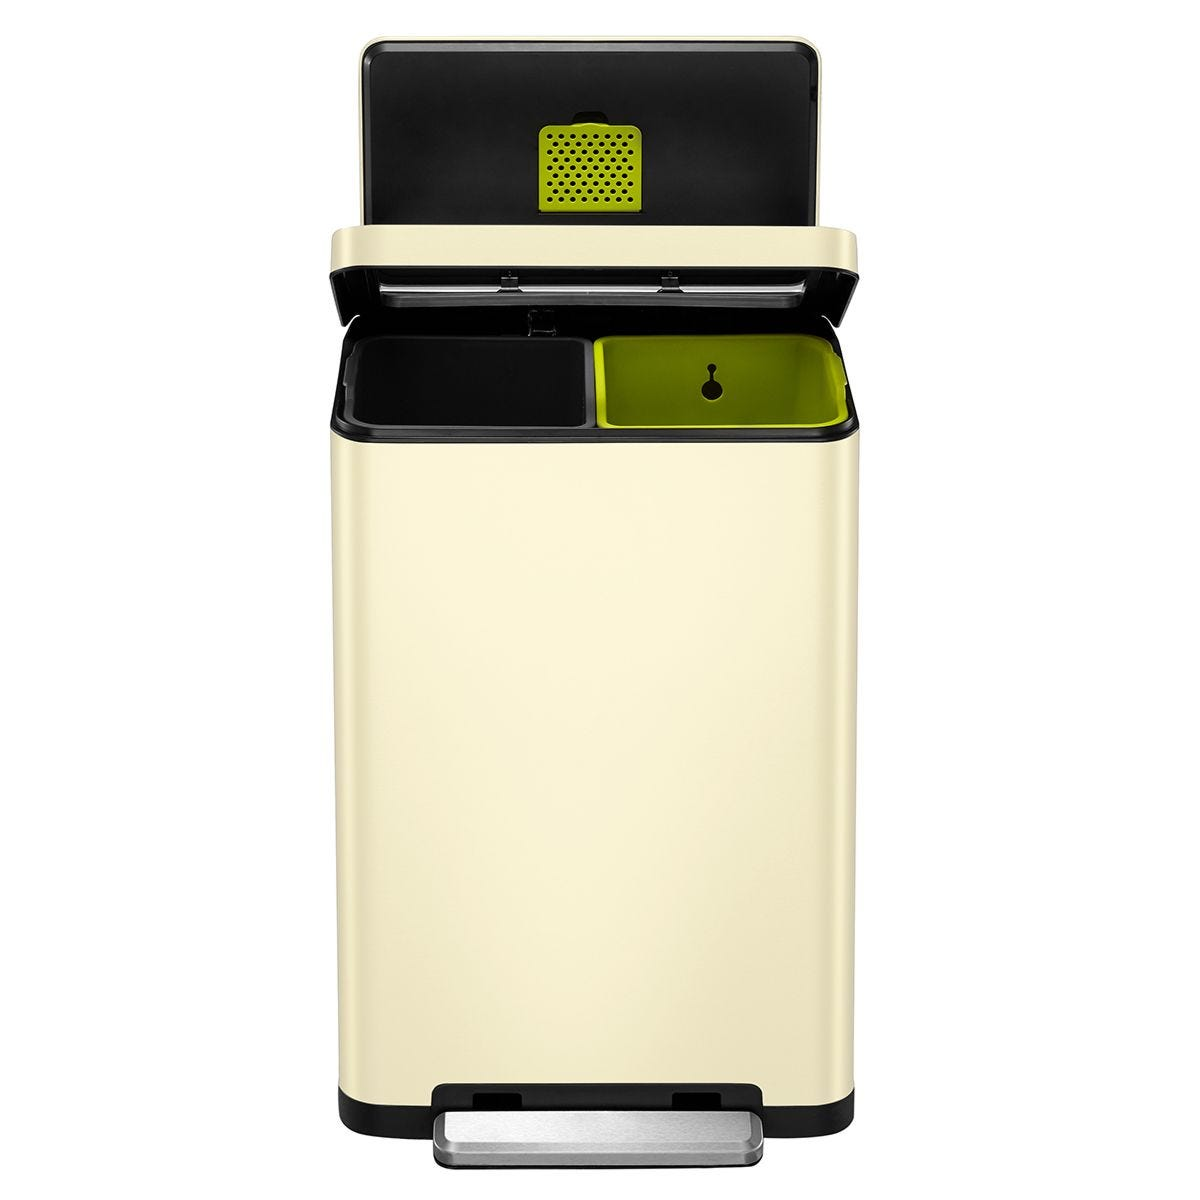 EKO X Cube Recycling Bin 40L - Cream